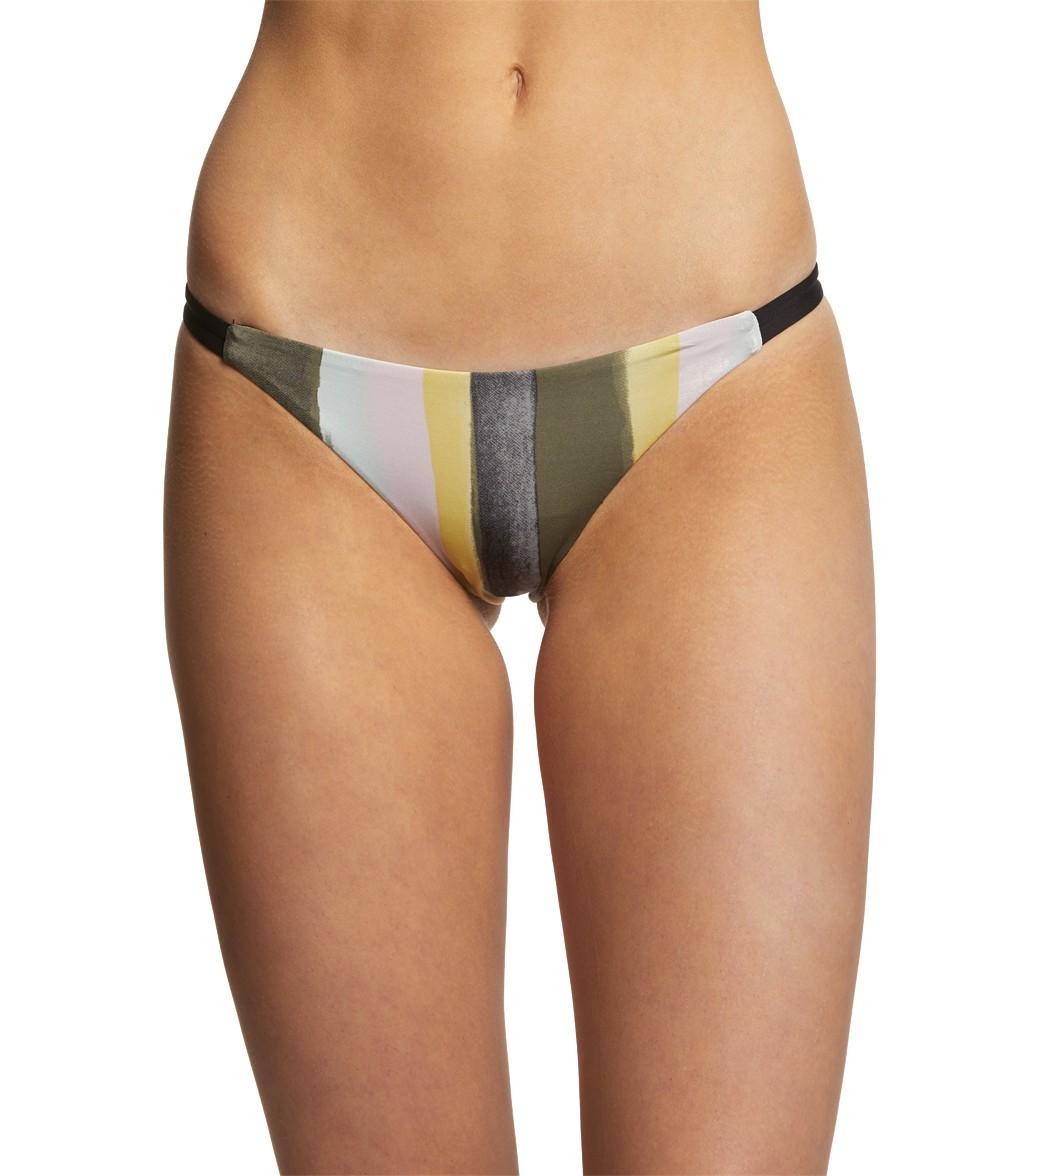 Hurley Women's Quick Dry Resin Surf Bikini Bottom